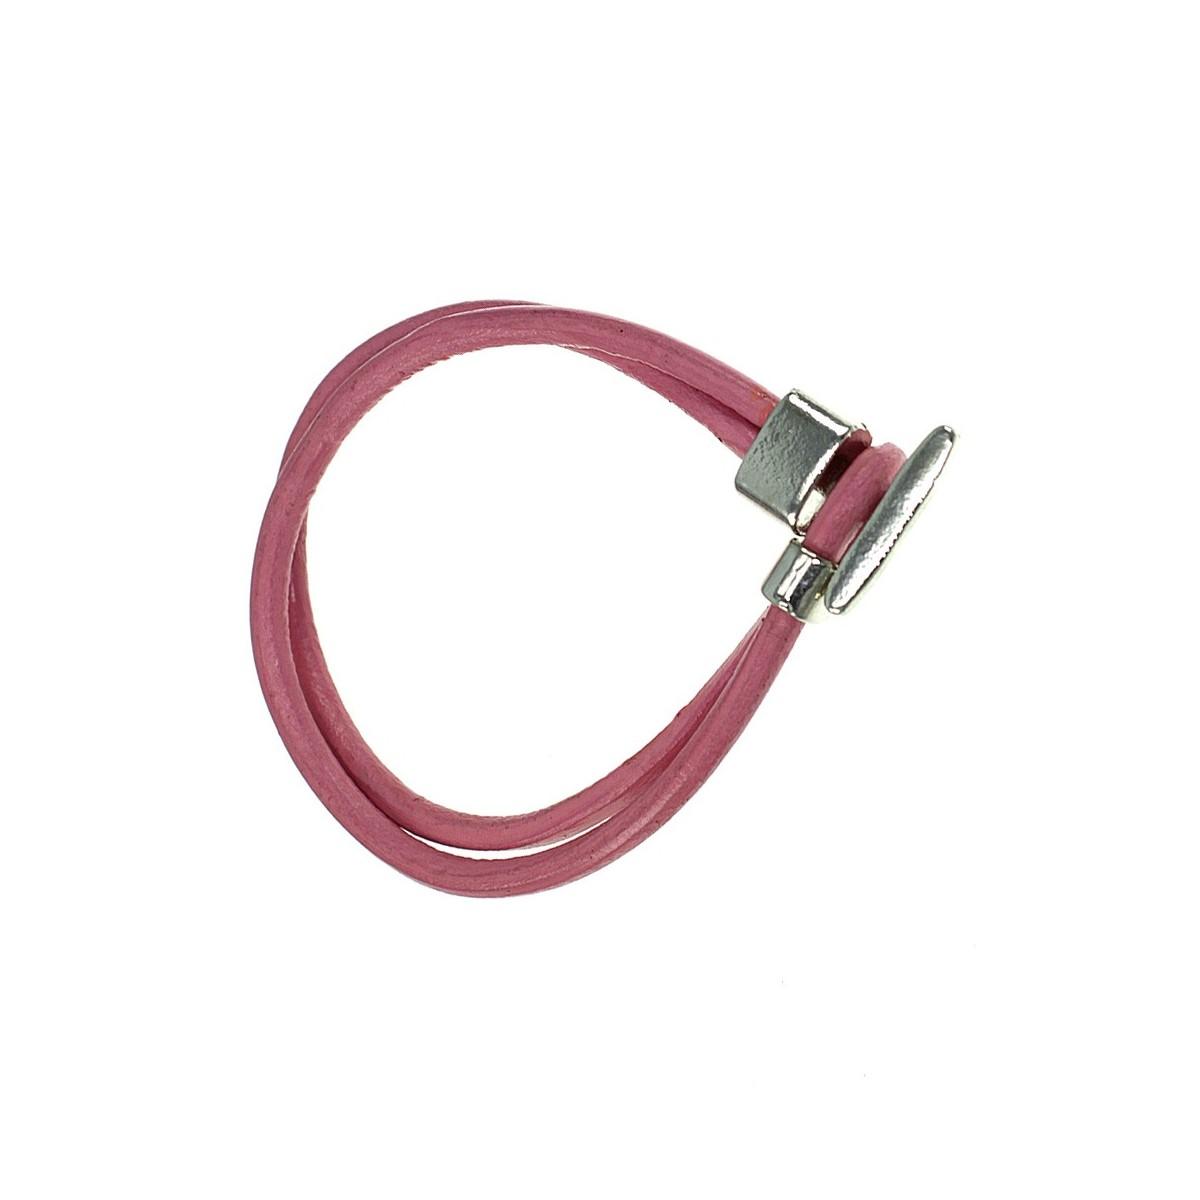 B314-ROSE Bracelet en cuir véritable rose